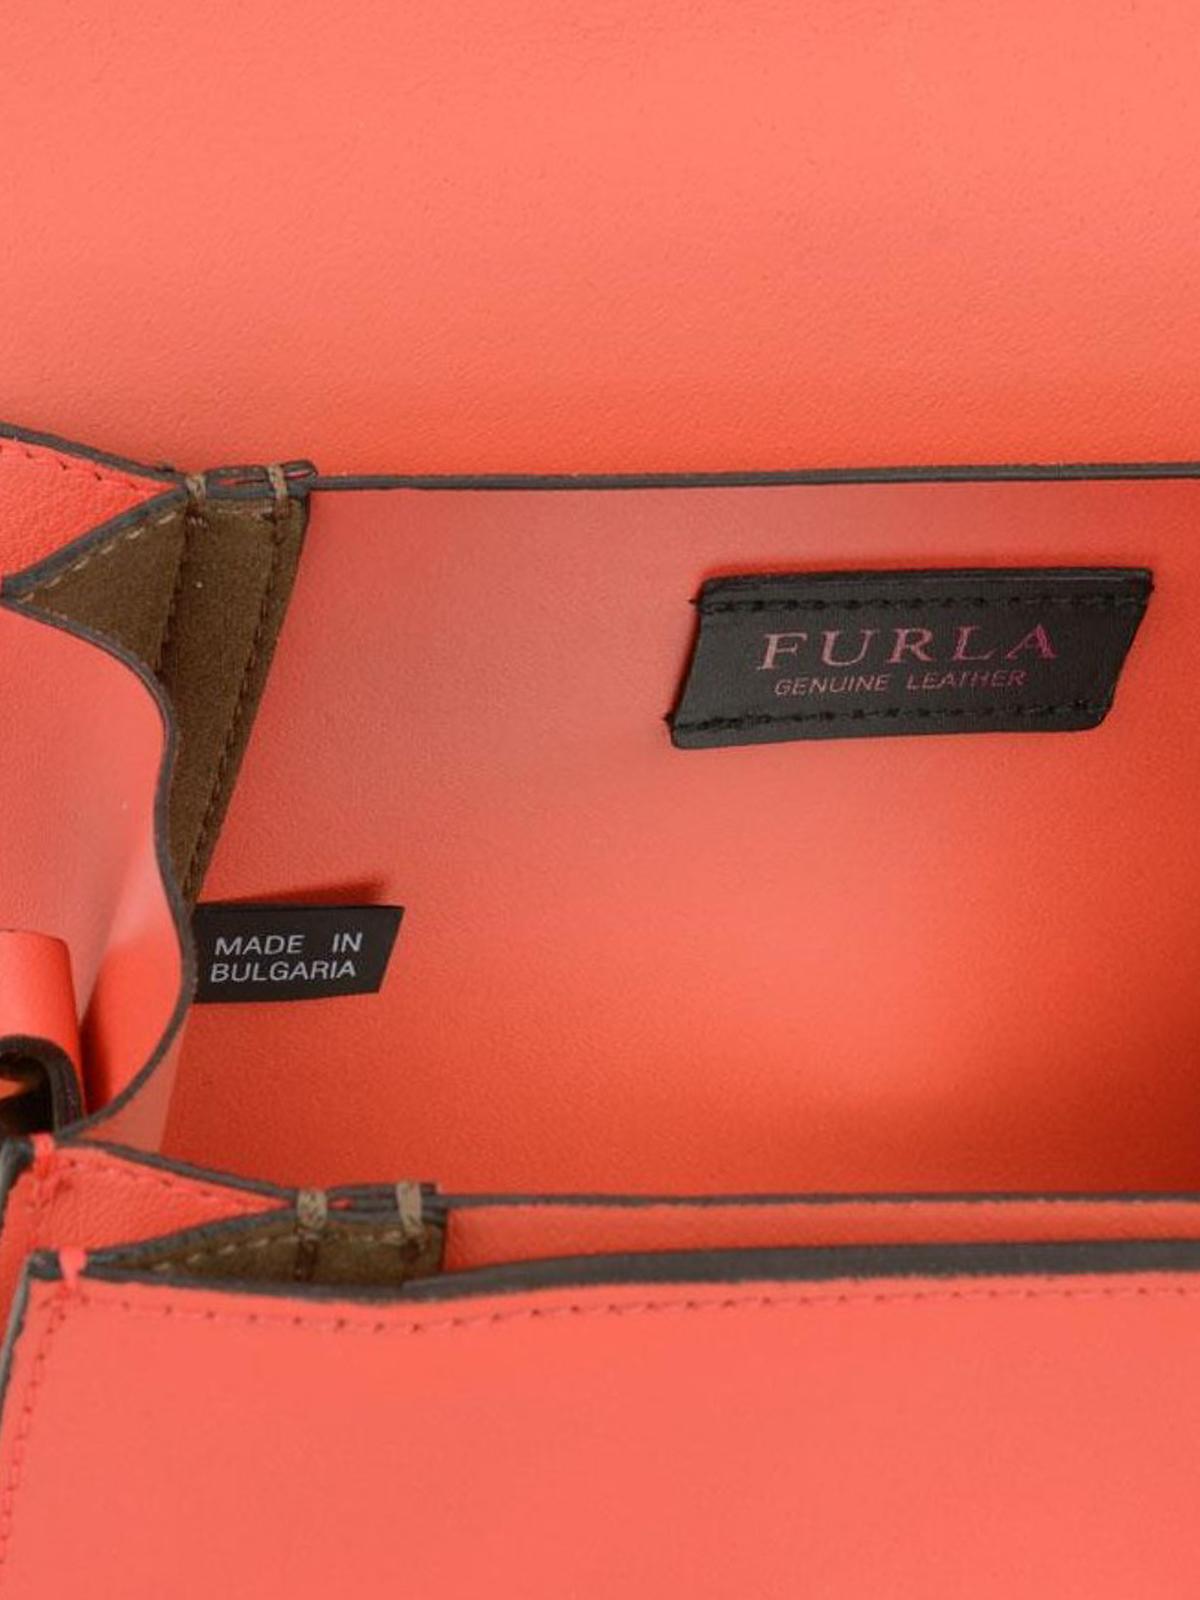 Furla Milano S orange soft leather bag OUMAJqBW6